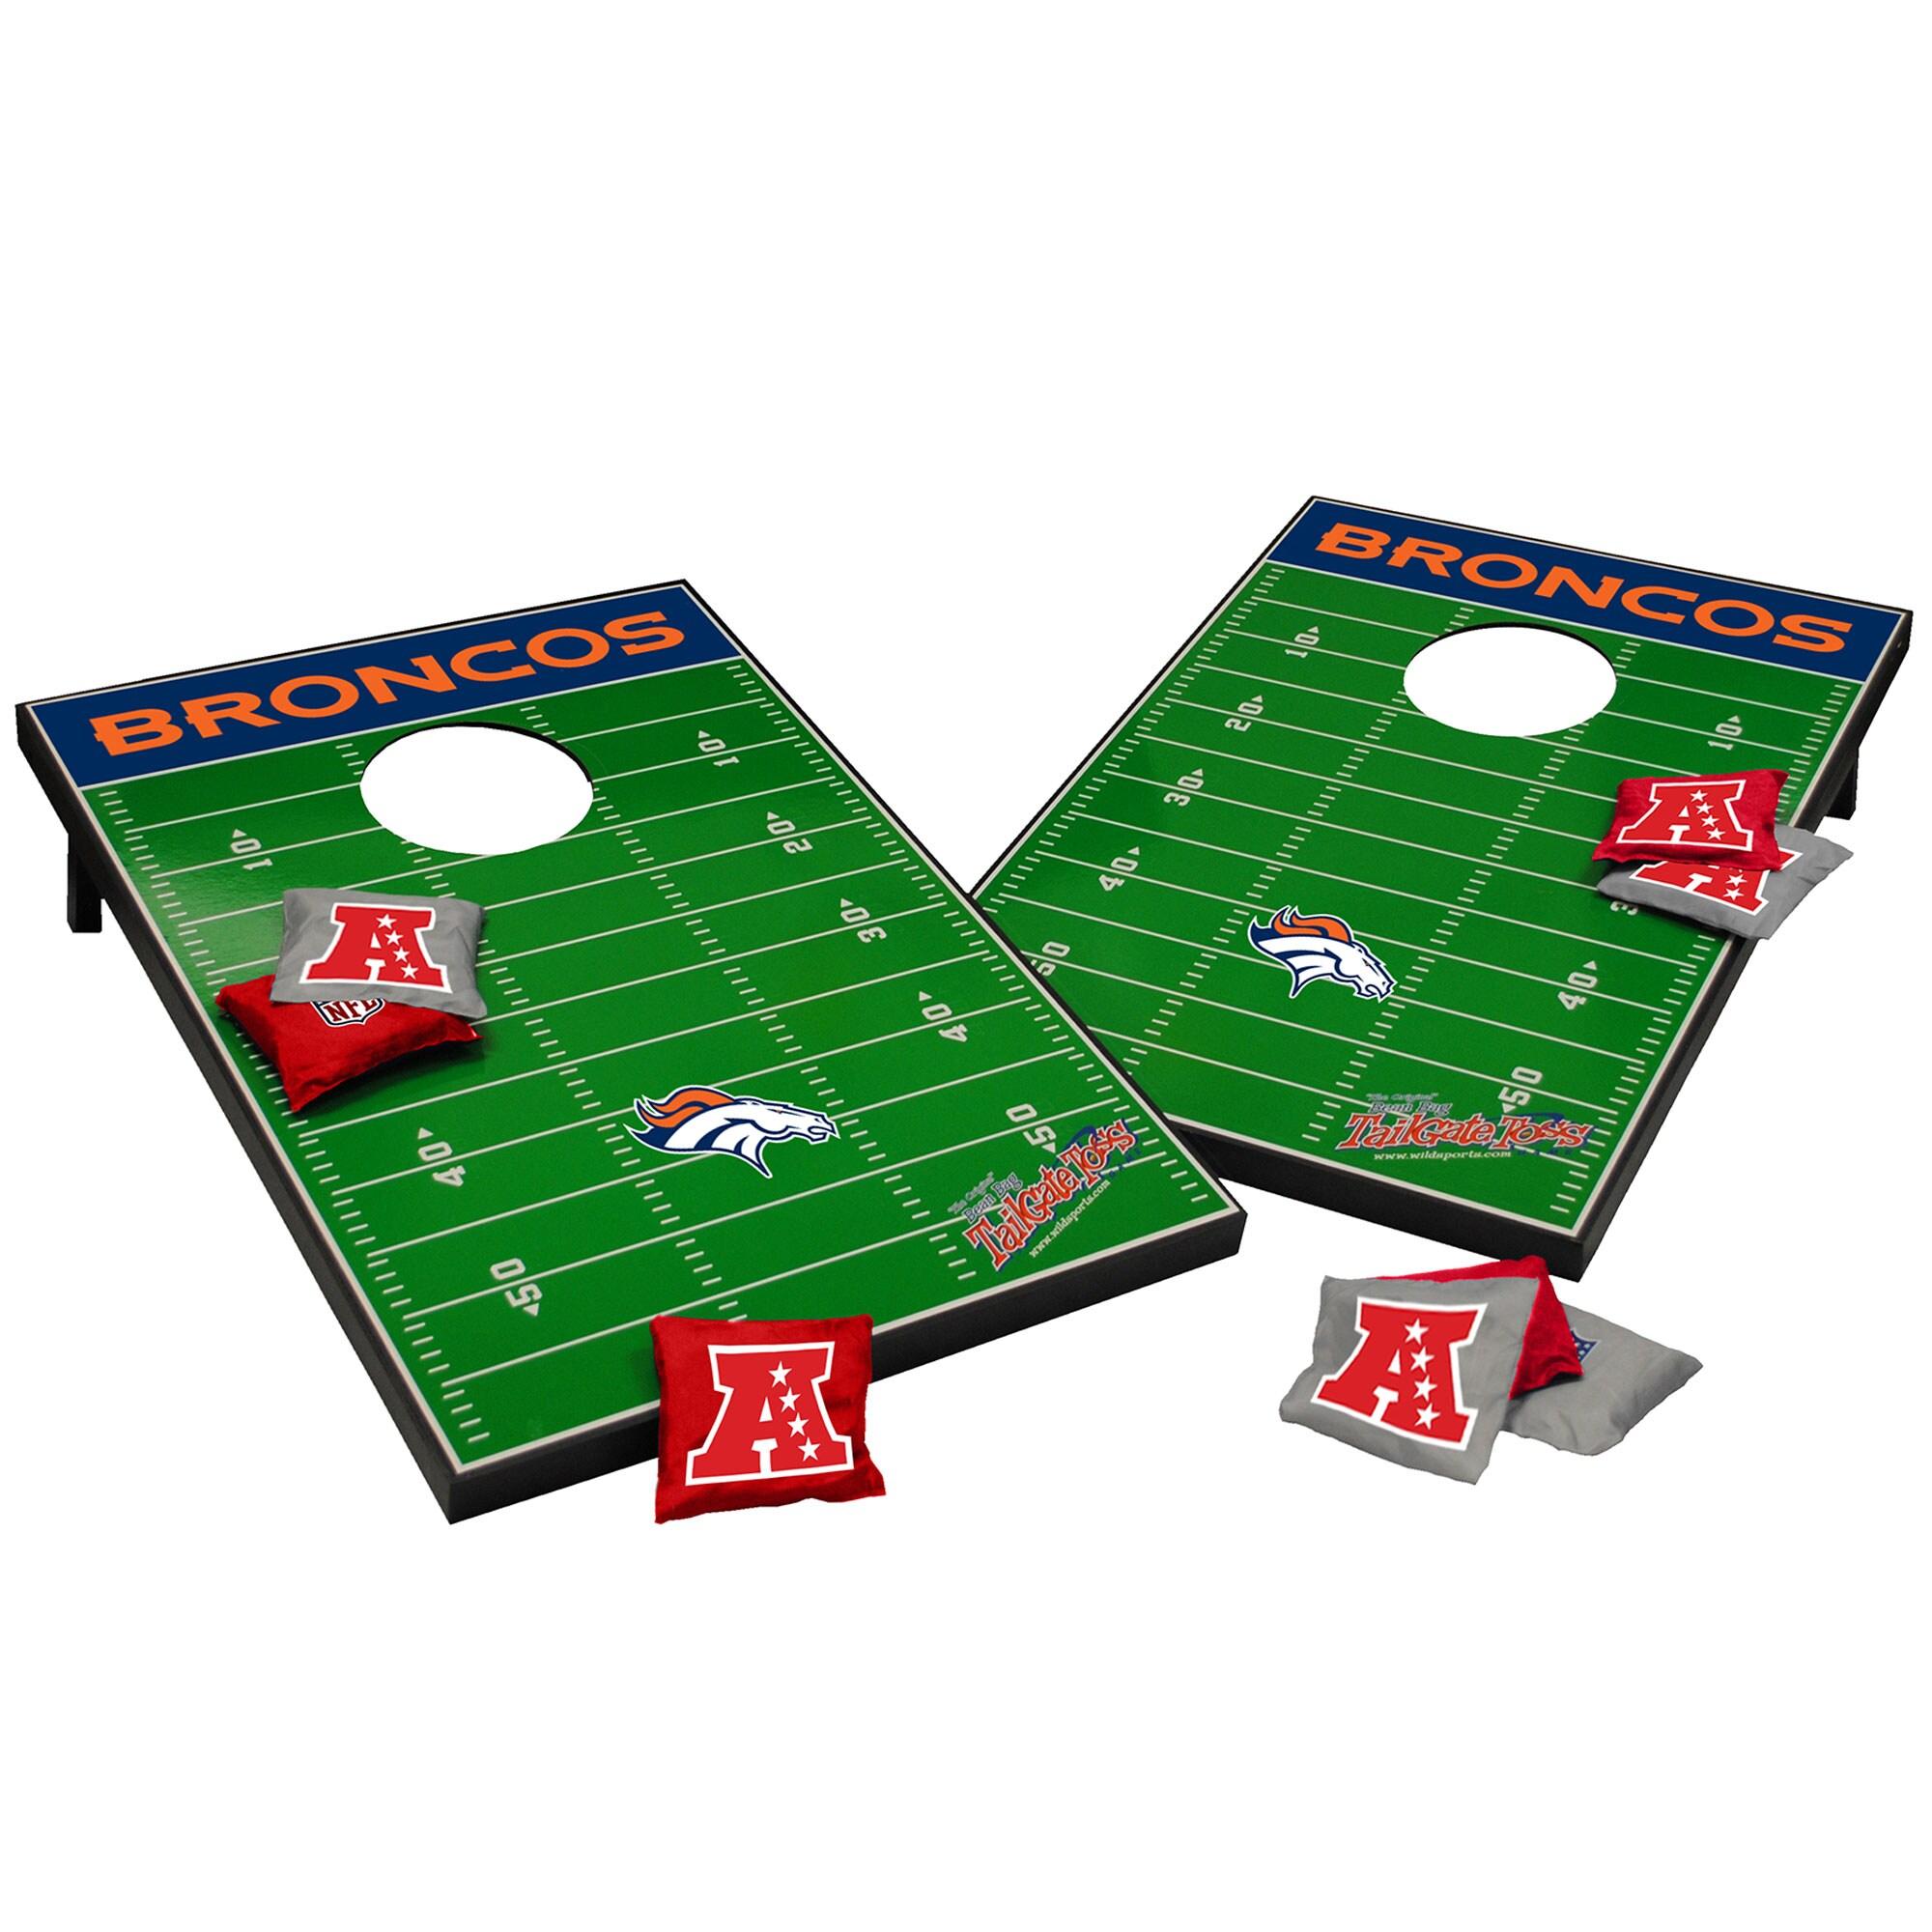 Denver Broncos 2' x 3' Cornhole Board Tailgate Toss Set